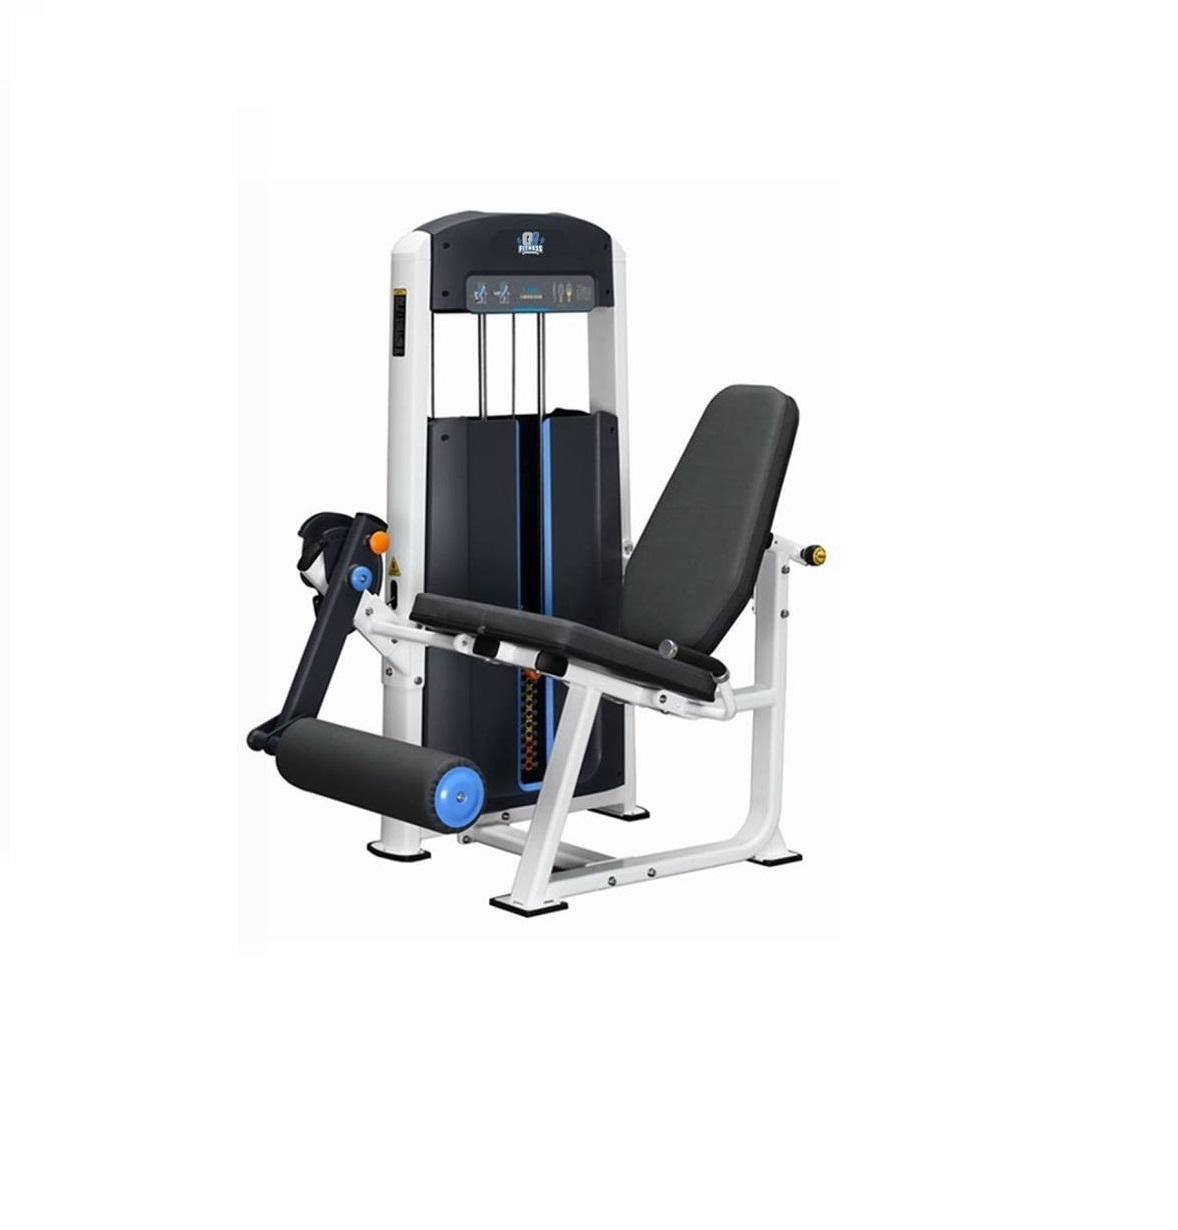 aparato-para-gimnasio-de-extension-de-pierna-con-peso-integrado-linea-g8 (5)